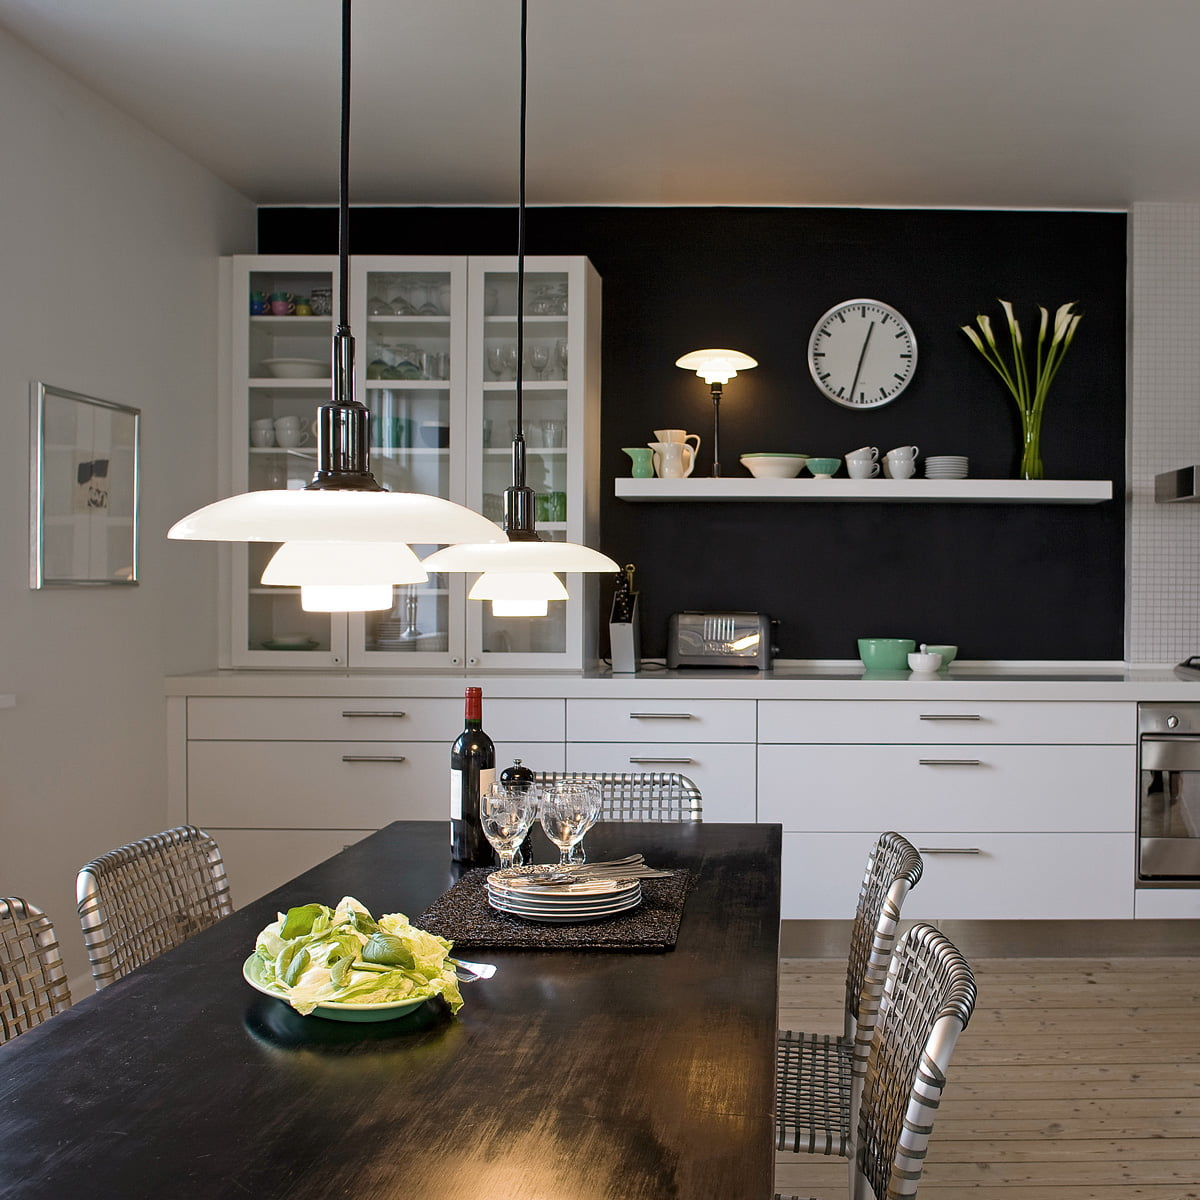 louis poulsen suspension lumineuse ph 3 2. Black Bedroom Furniture Sets. Home Design Ideas